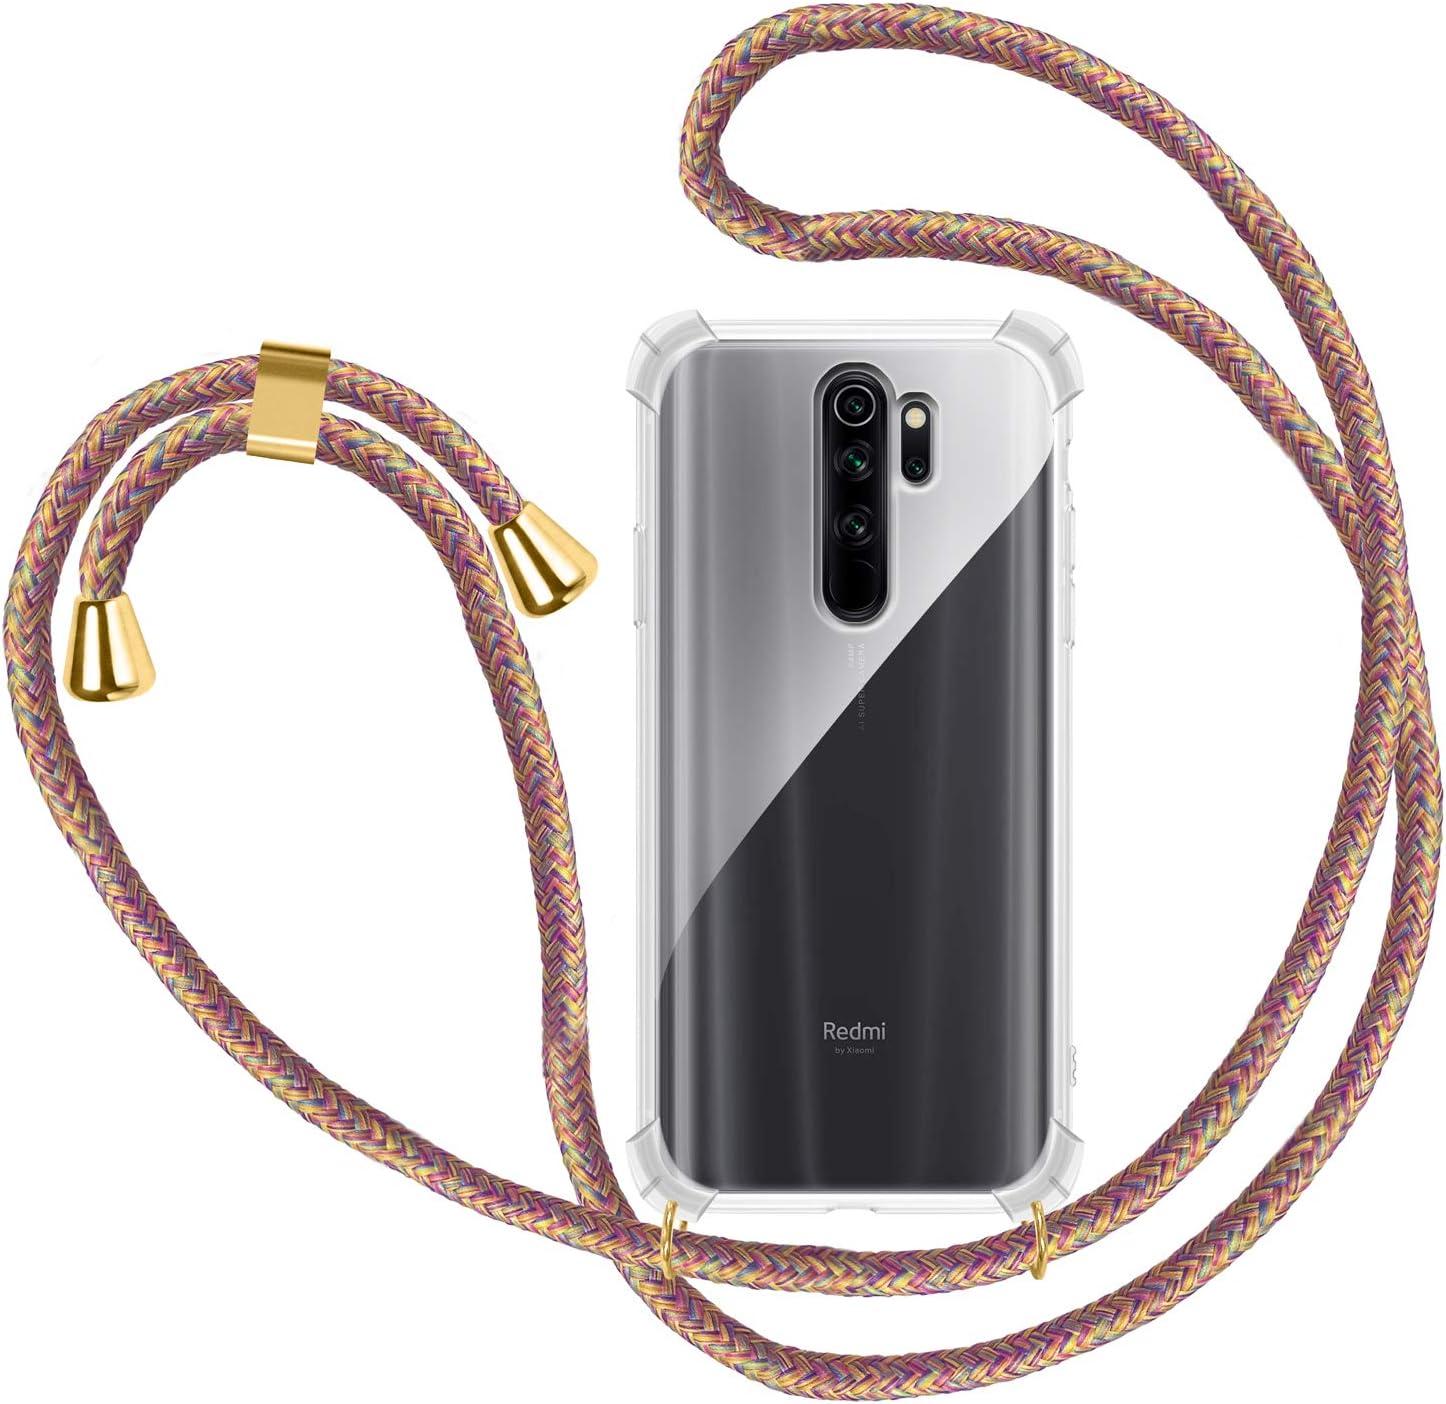 Funda con Cuerda para Xiaomi Redmi Note 8 Pro Oro Rosa Carcasa Transparente TPU Suave Silicona Case con Correa Colgante Ajustable Collar Correa de Cuello Cadena Cord/ón para Xiaomi Redmi Note 8 Pro